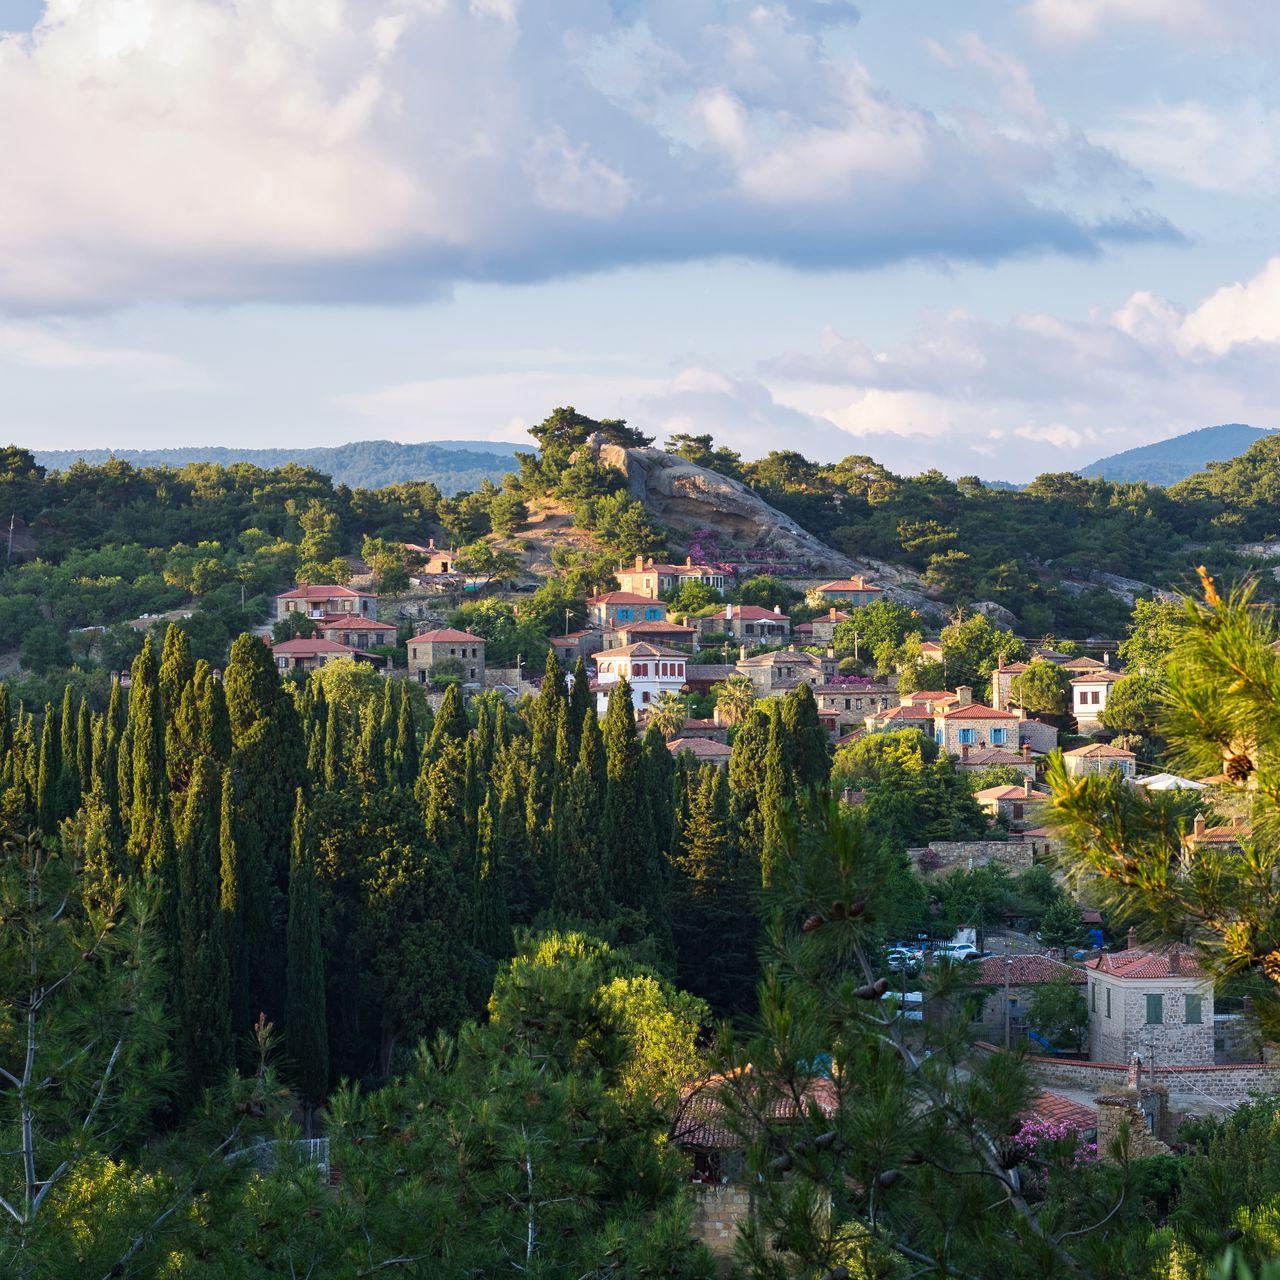 1280x1280 Wallpaper village, mountain, buildings, trees